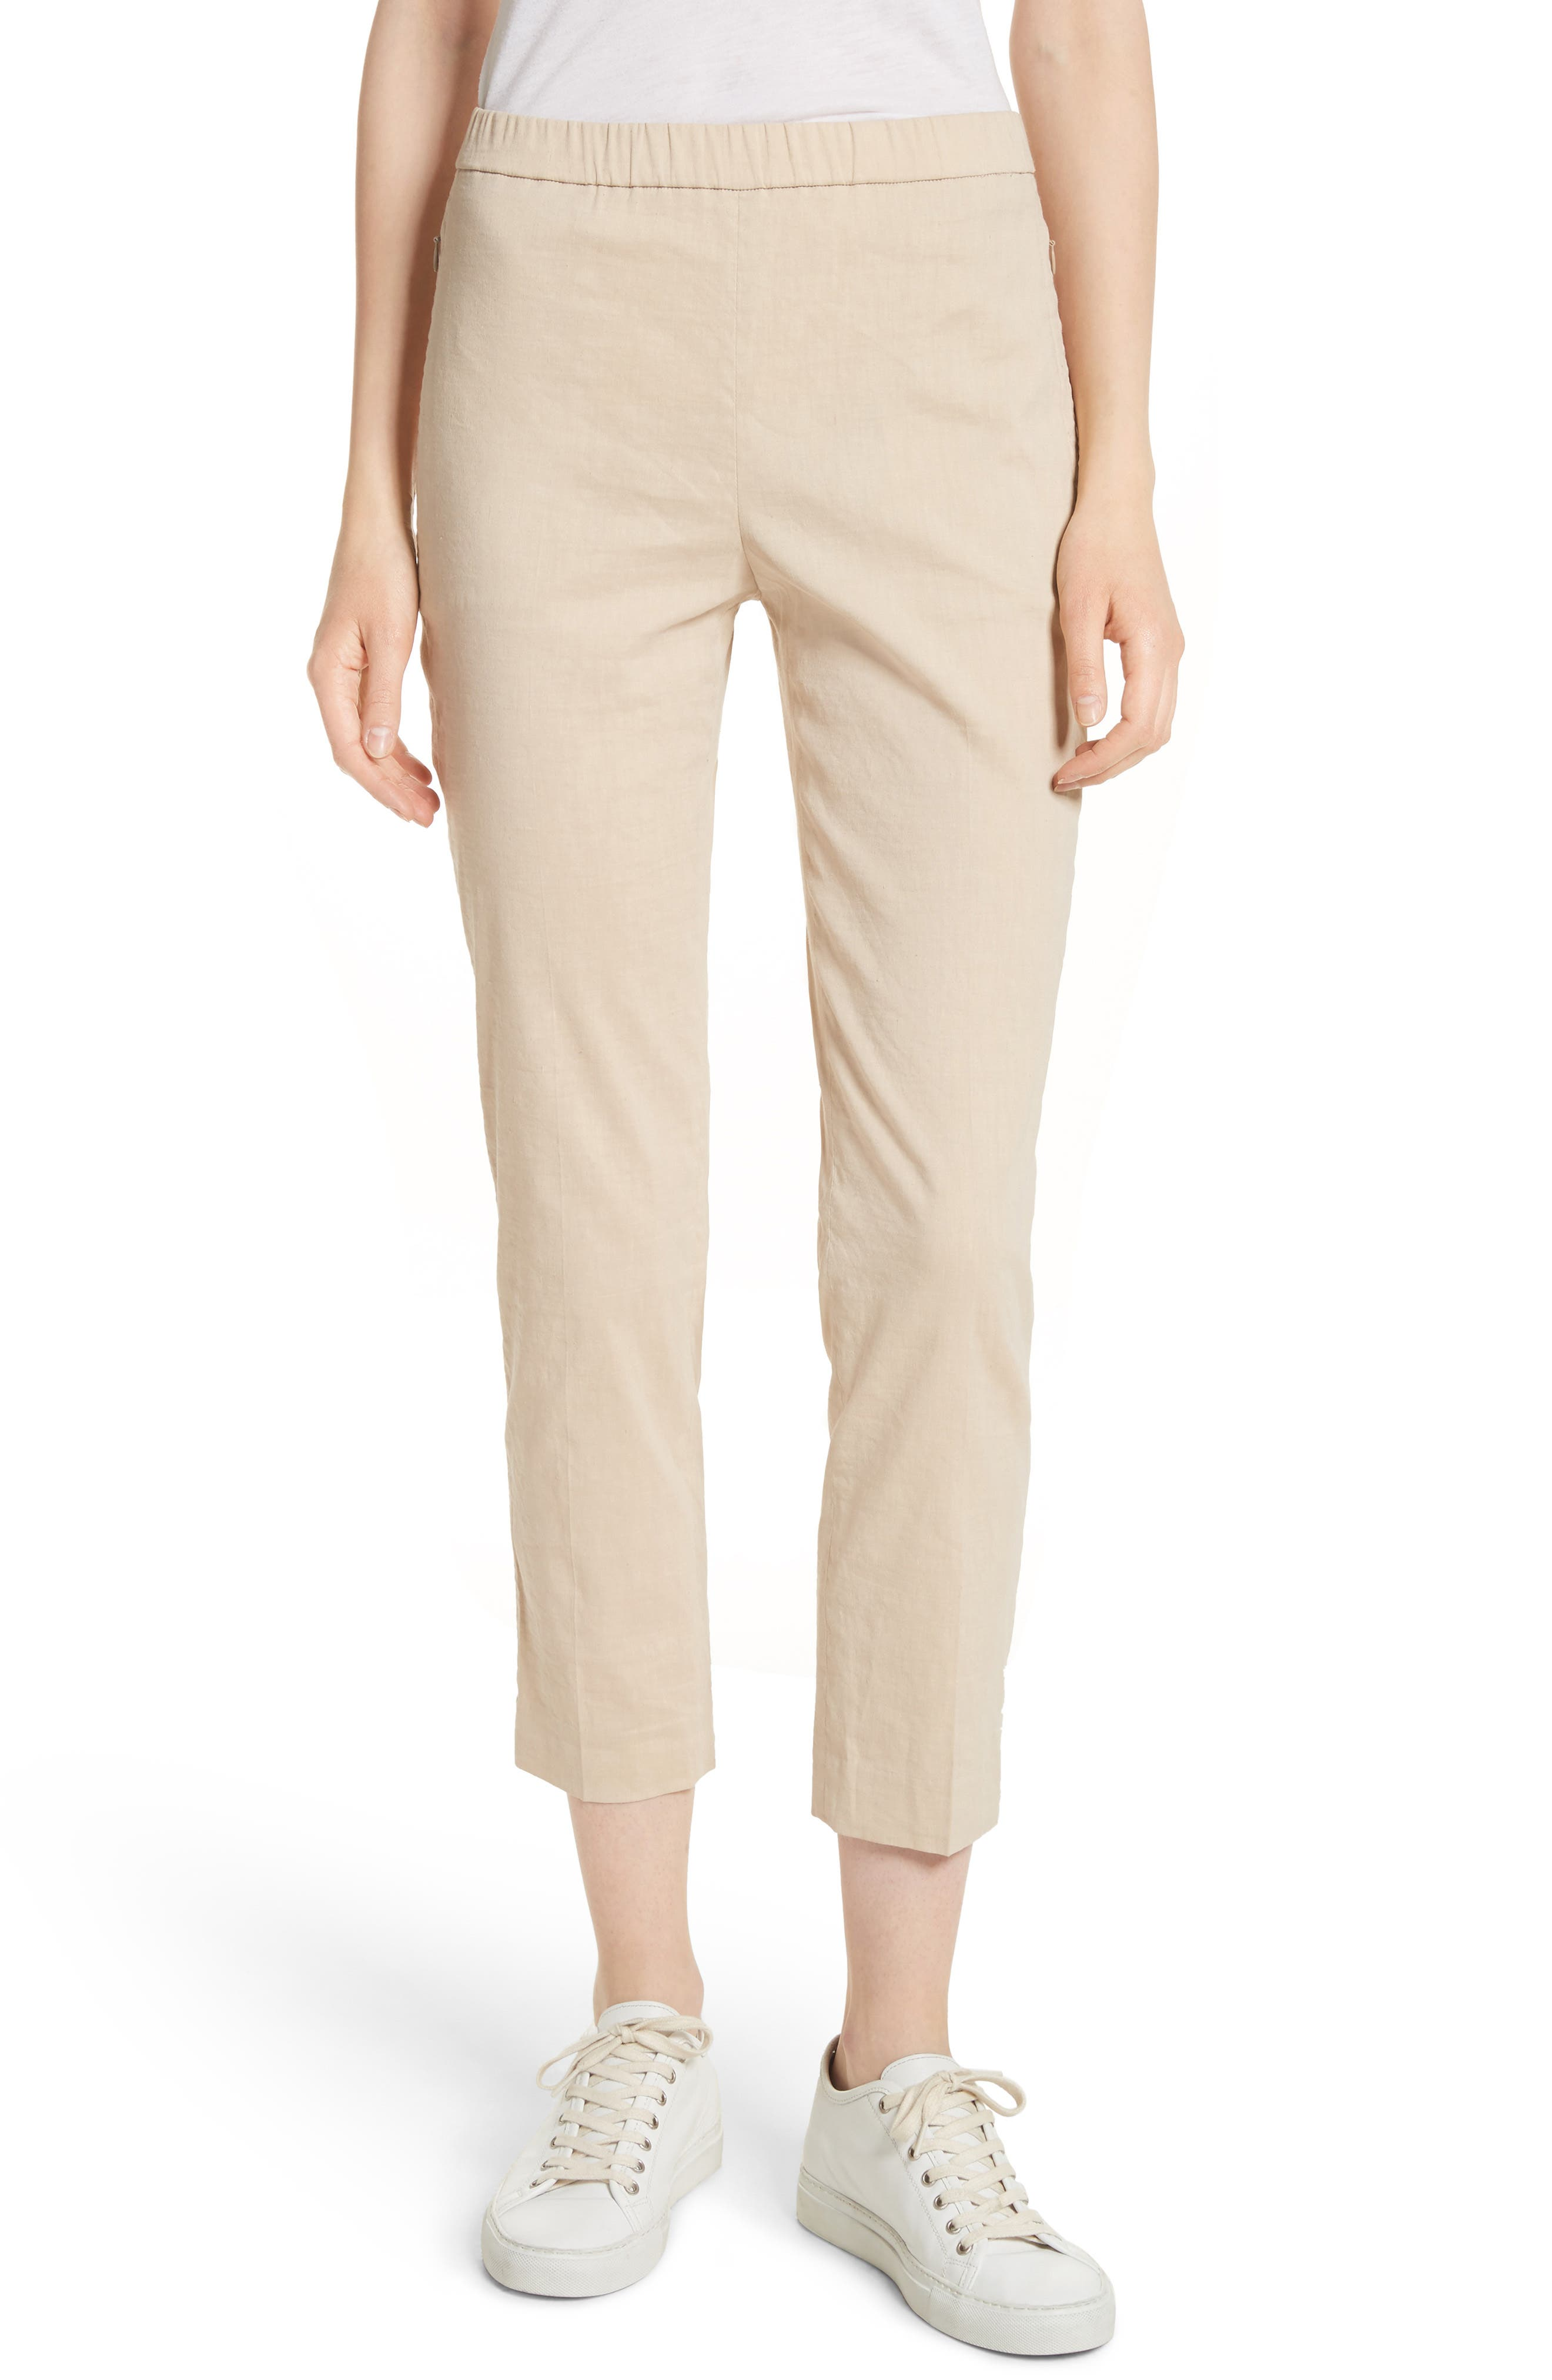 Pull-On Linen Blend Pants,                             Main thumbnail 1, color,                             Light Wheat